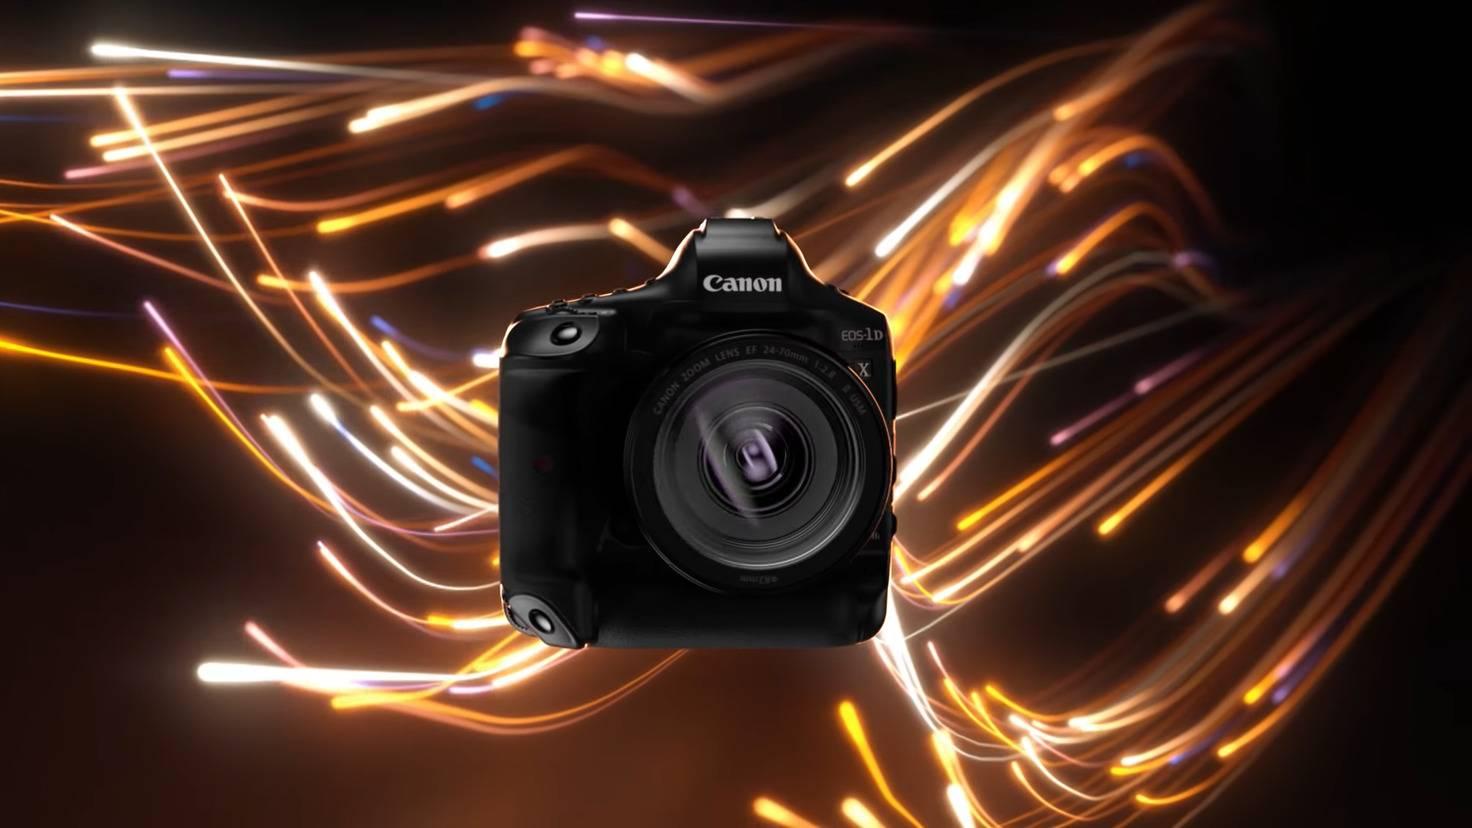 Canon-1D-X-Mark-3-DSLR